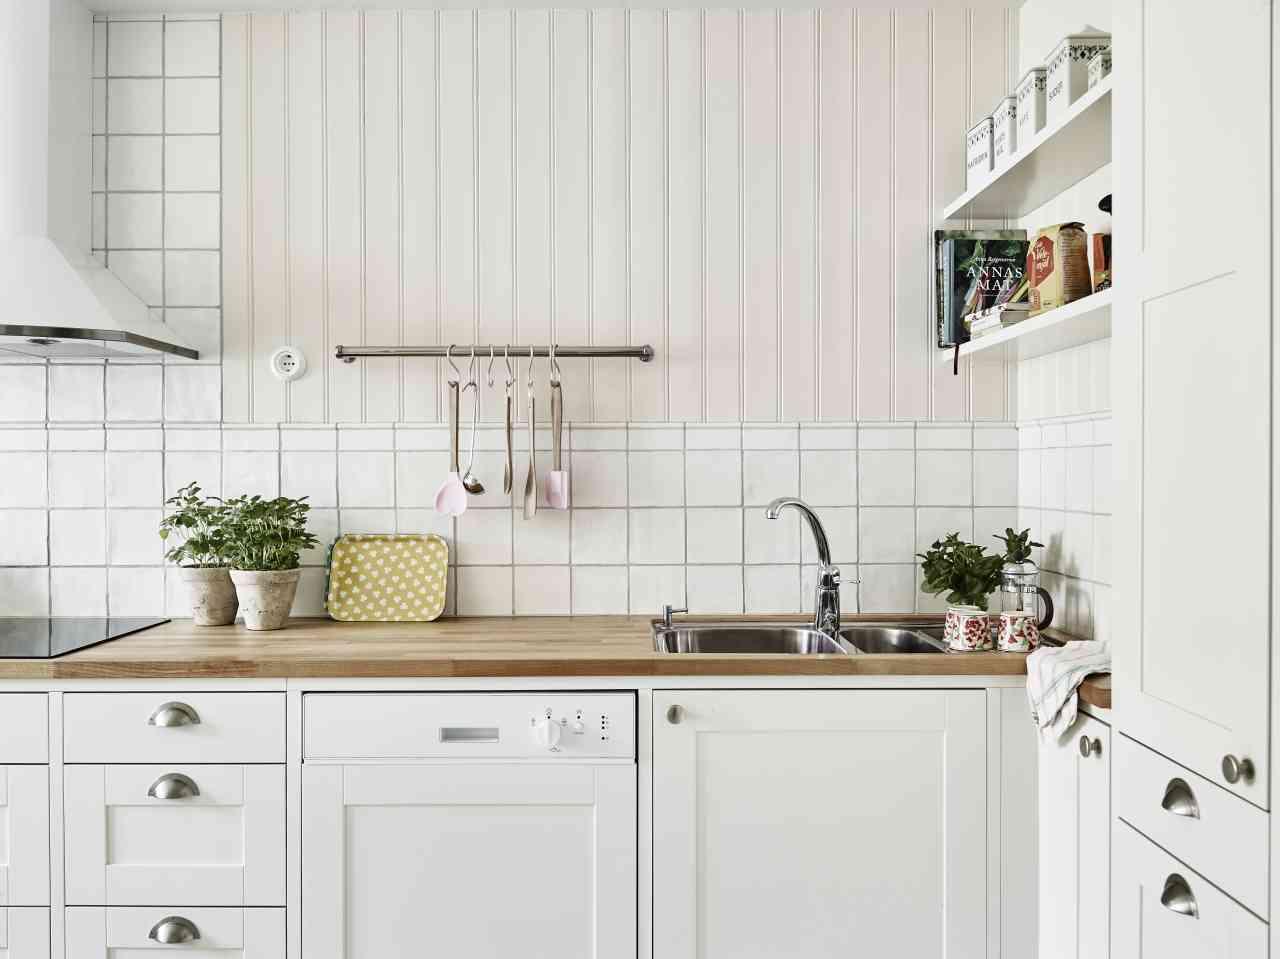 decoración de interiores - casa - cocina blanca